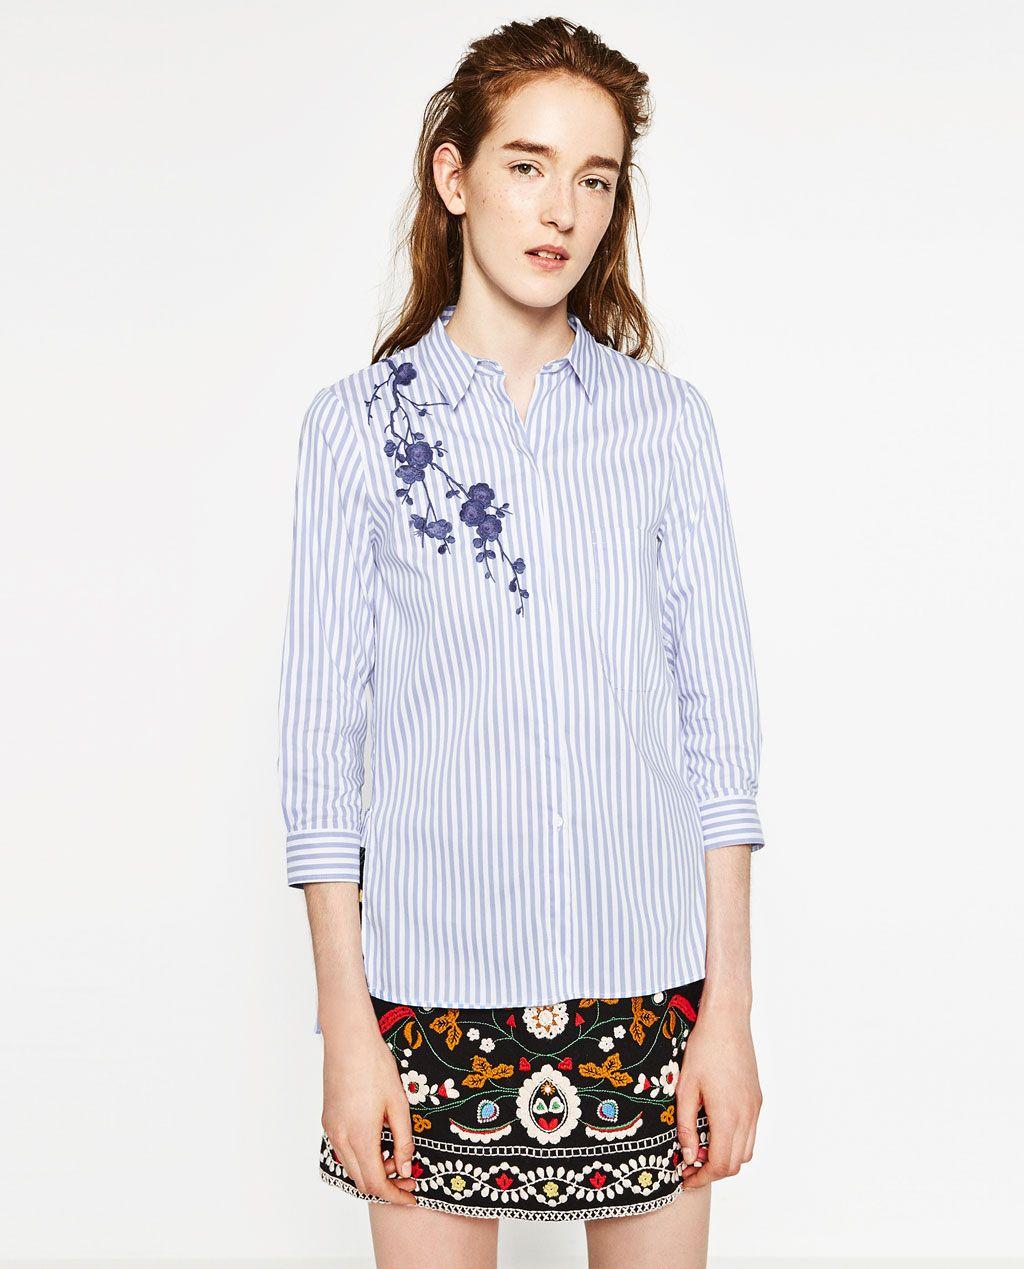 Image 2 Of EMBROIDERED SHIRT From Zara | Zara | Pinterest | Zara United States Zara Women And Woman